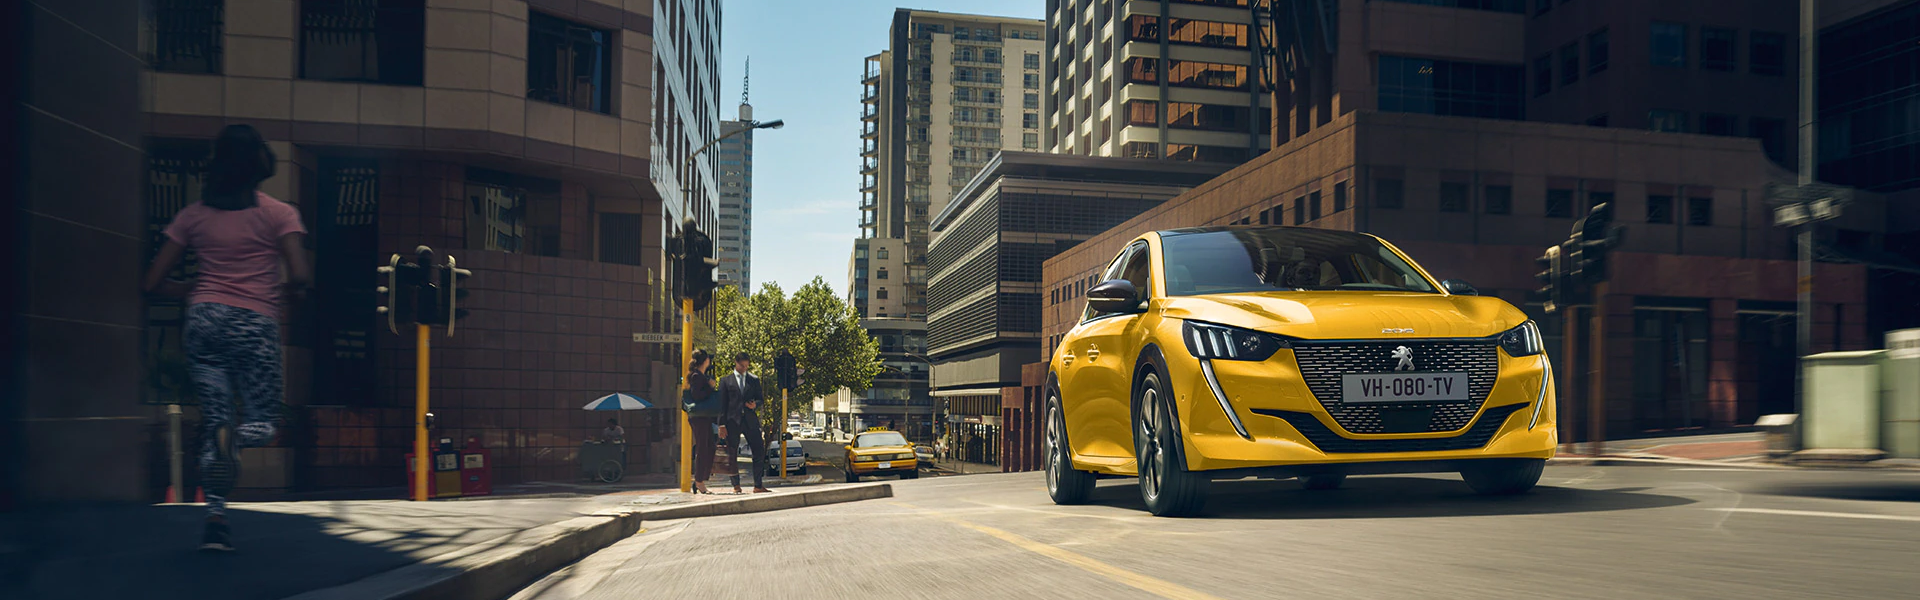 Peugeot 208 em amarelo